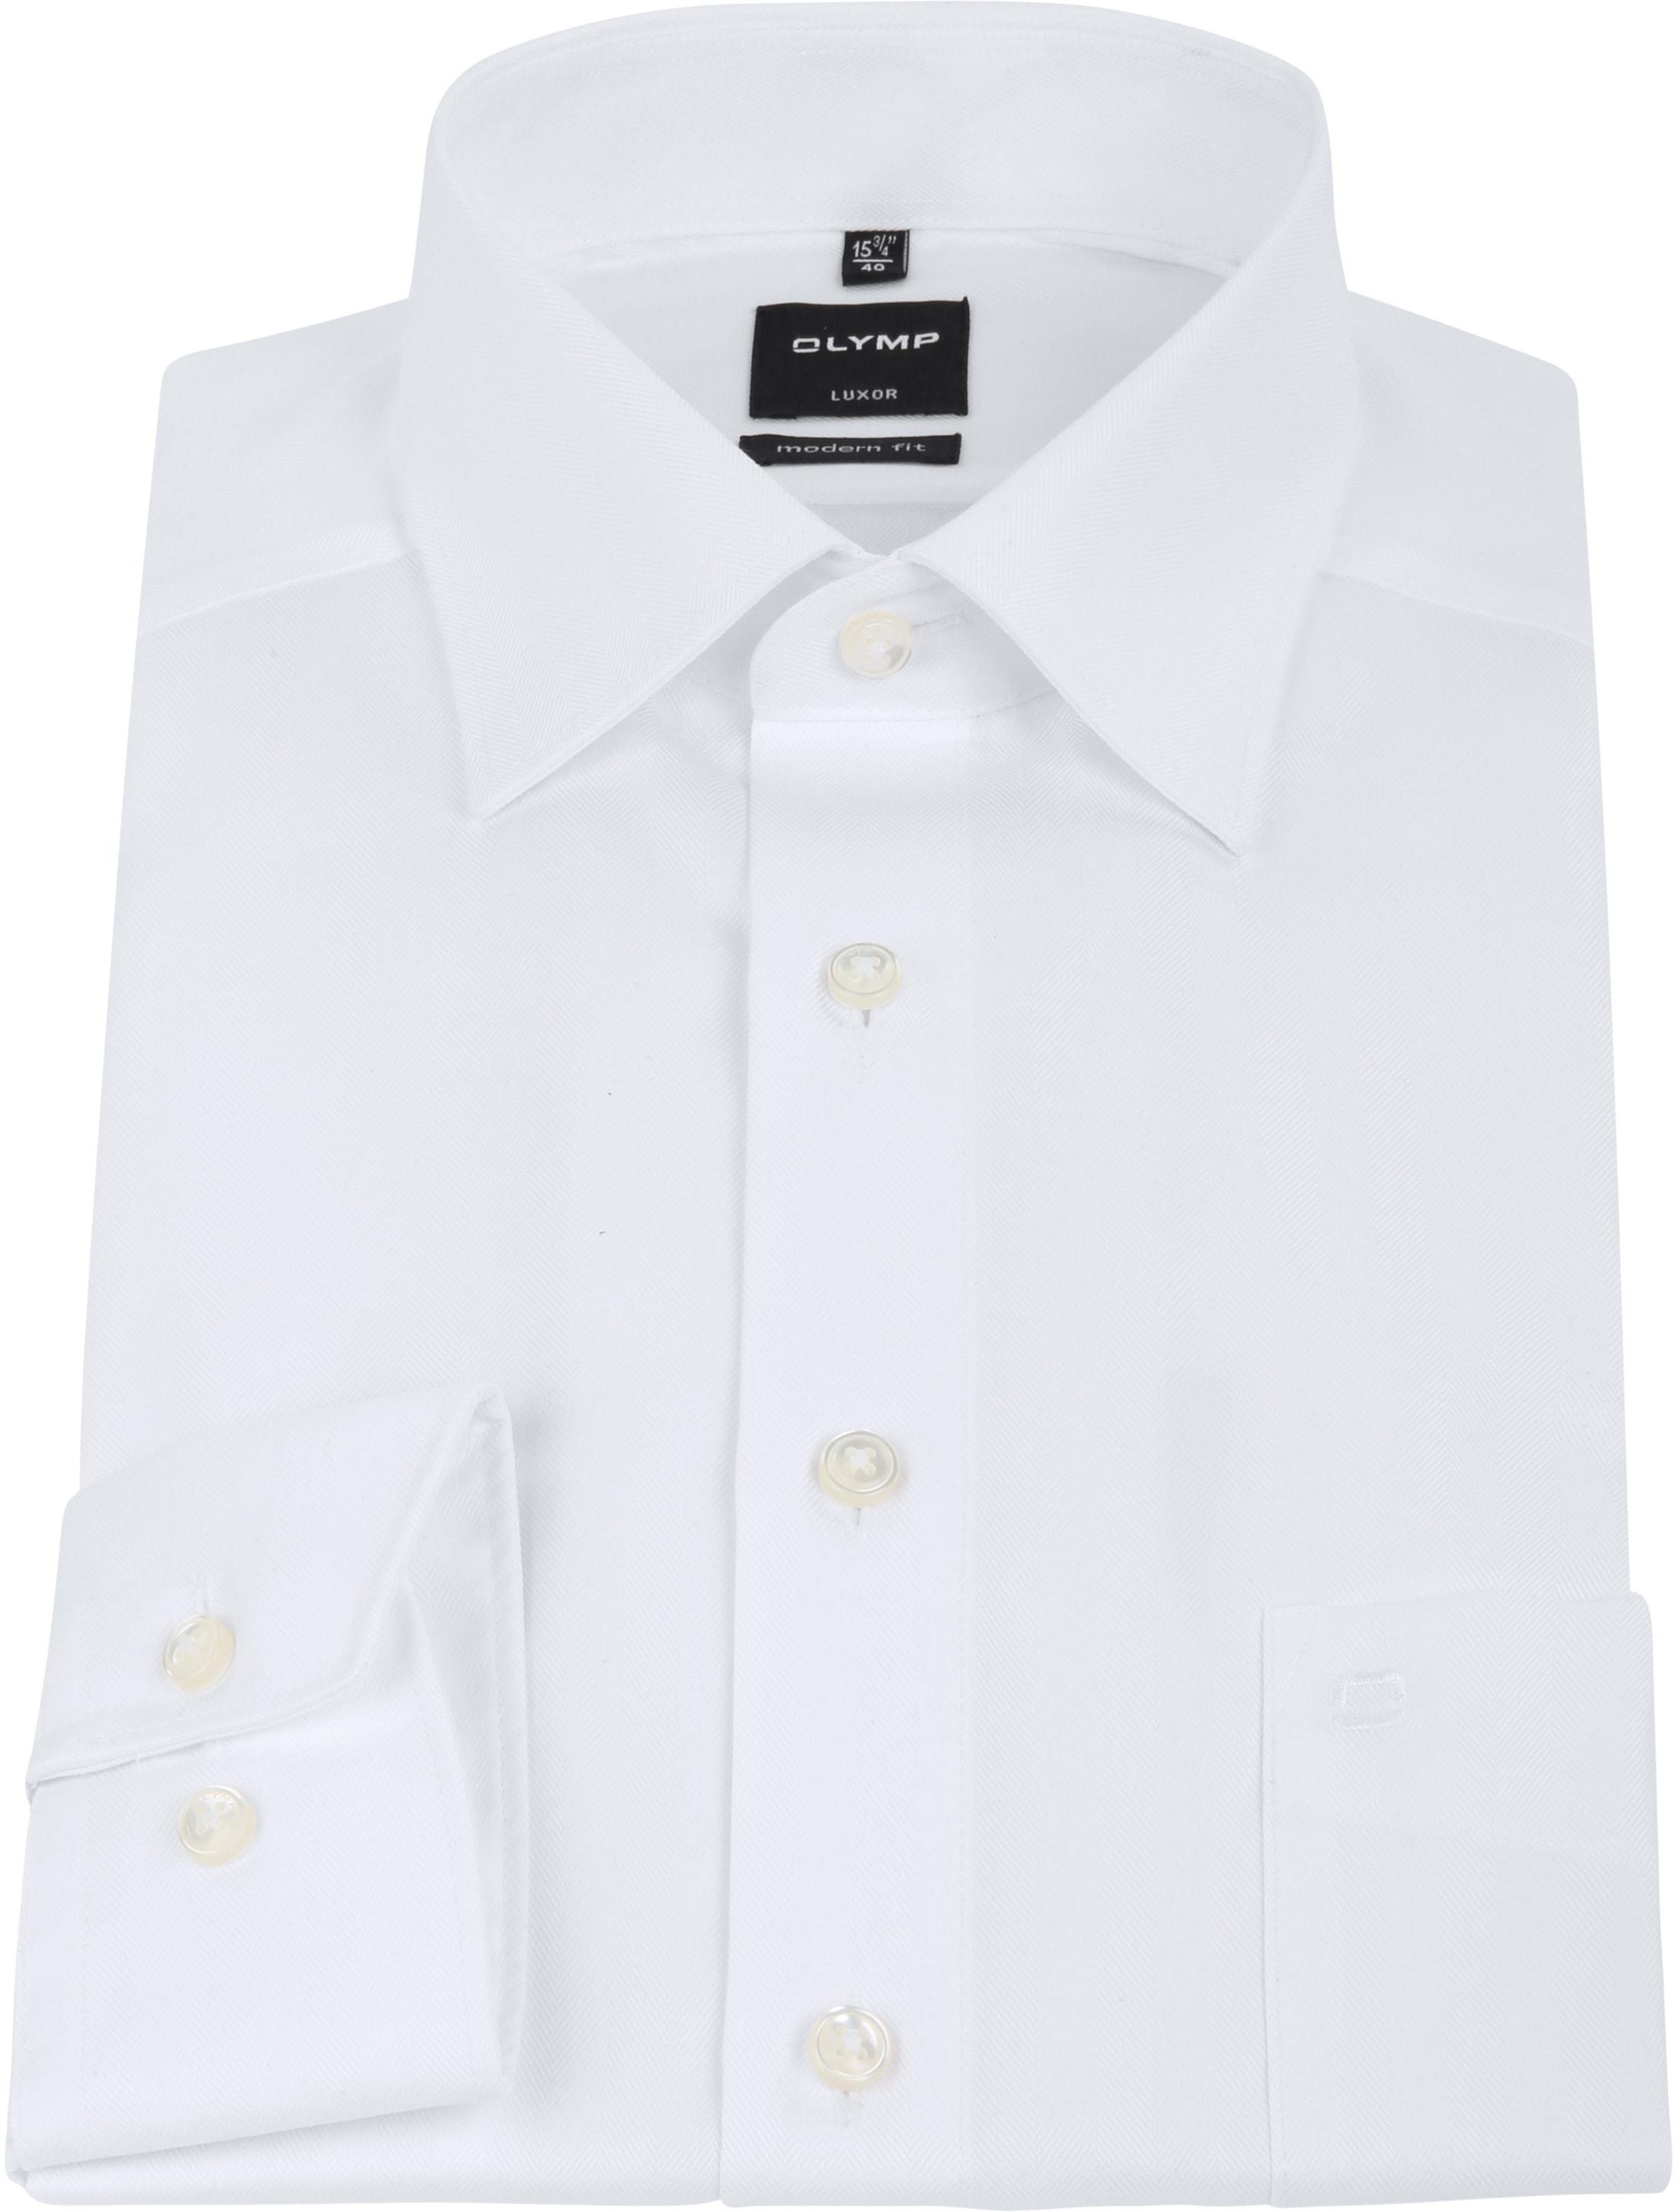 olymp luxor overhemd slim line white herring 033564. Black Bedroom Furniture Sets. Home Design Ideas